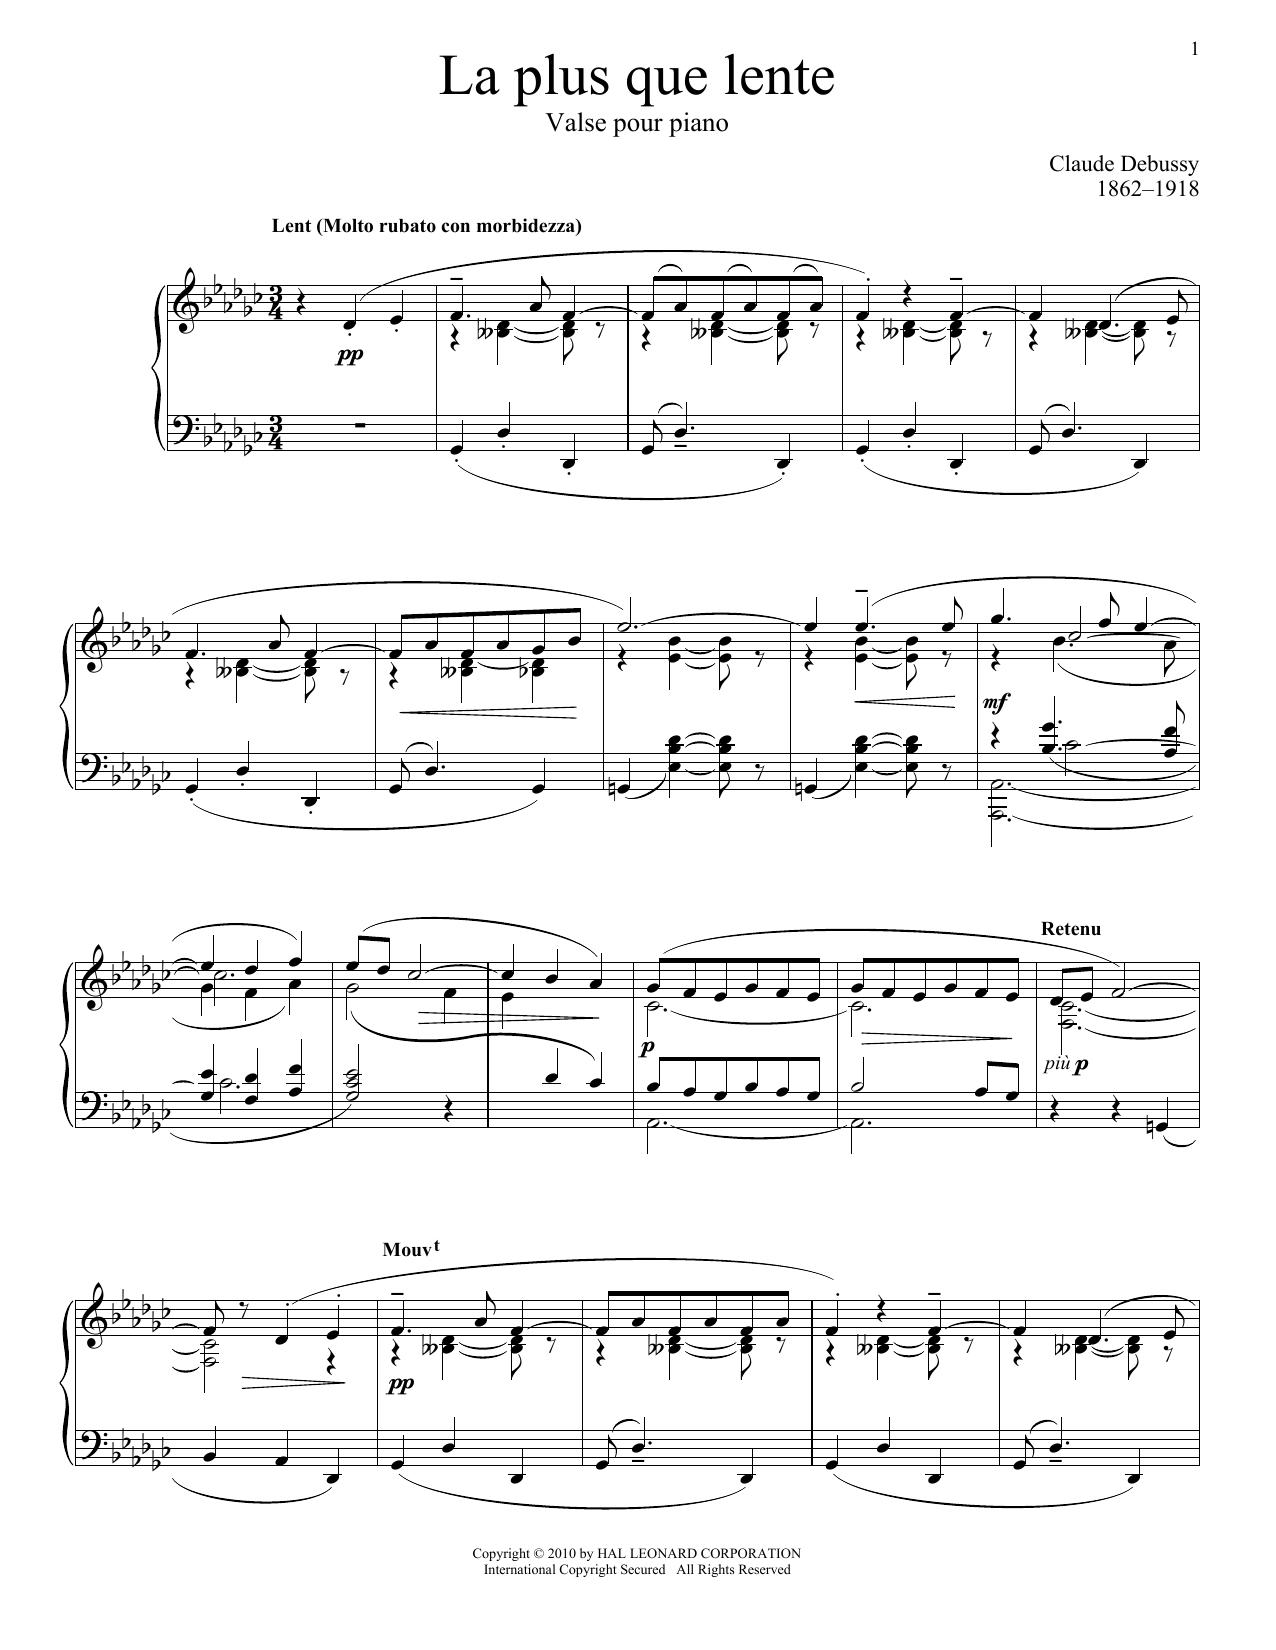 Claude Debussy La Plus Que Lente sheet music notes and chords. Download Printable PDF.